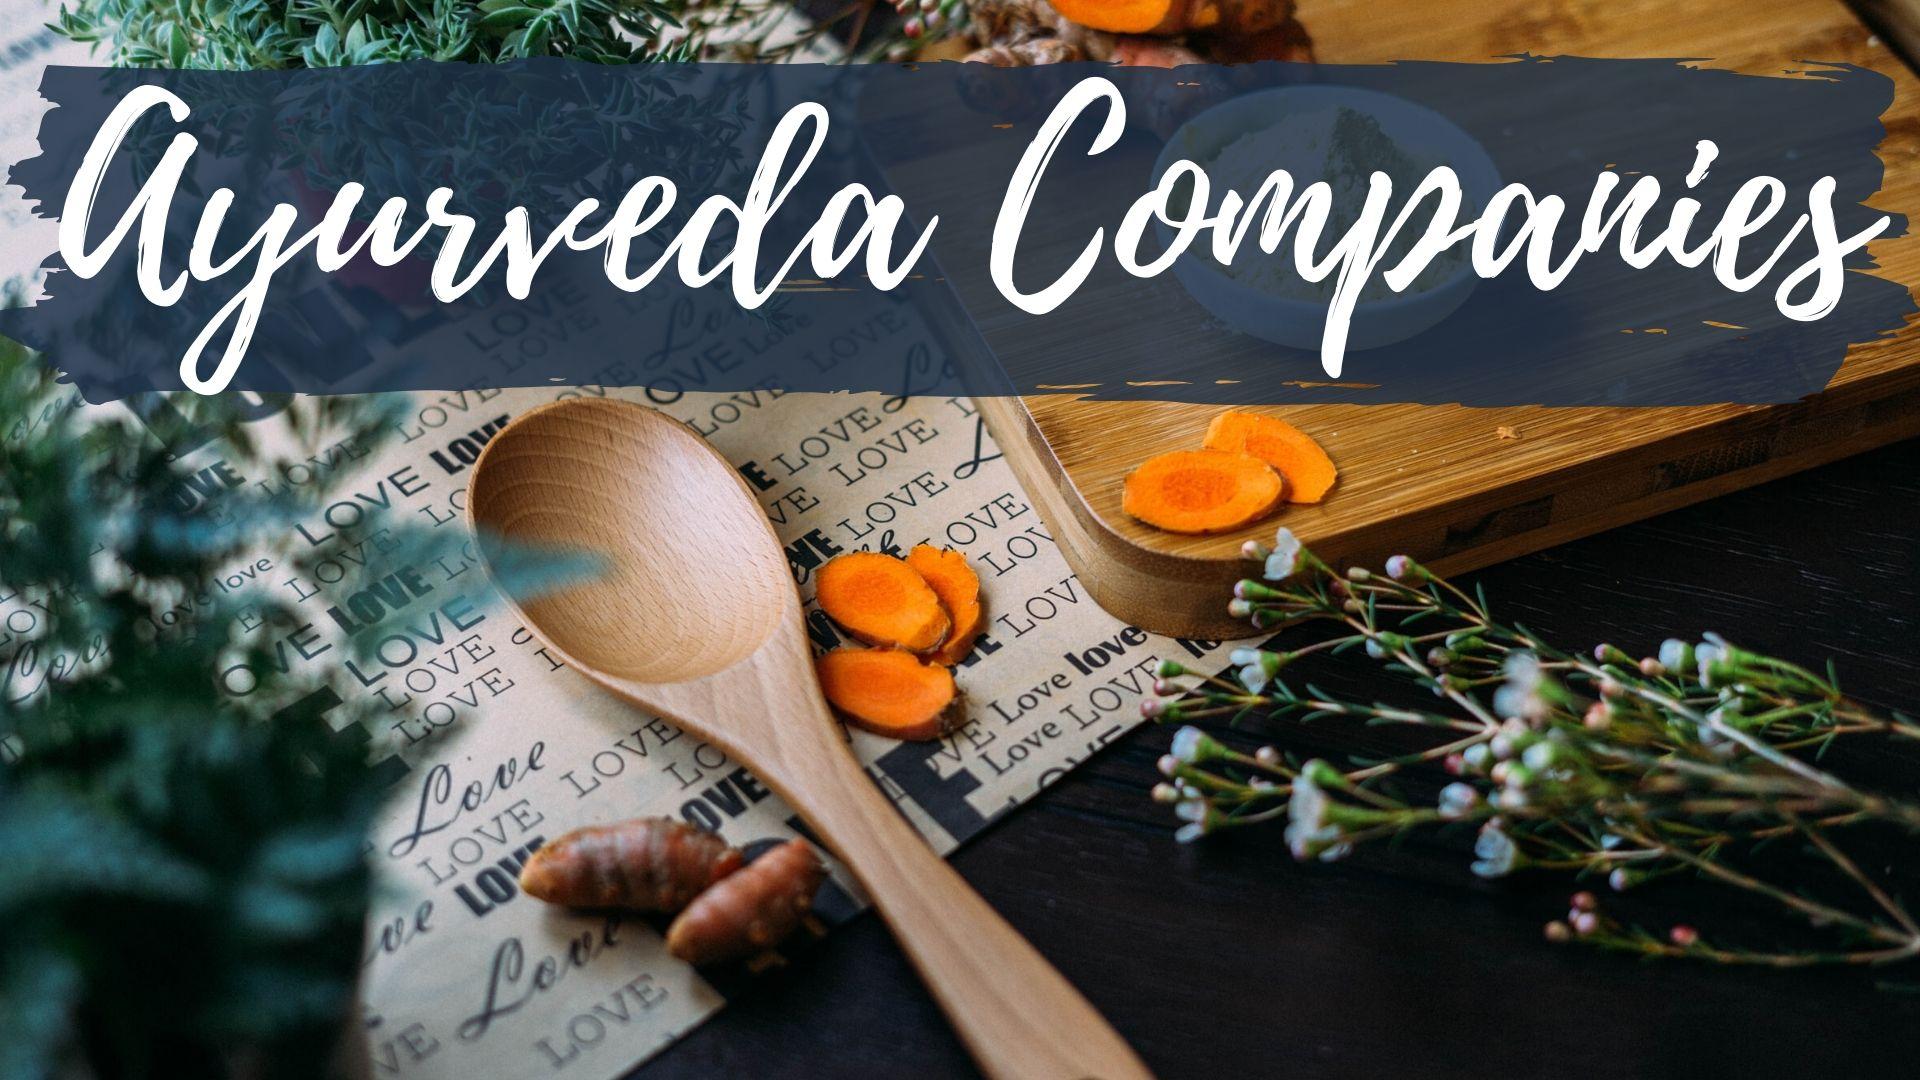 Ayurveda companies